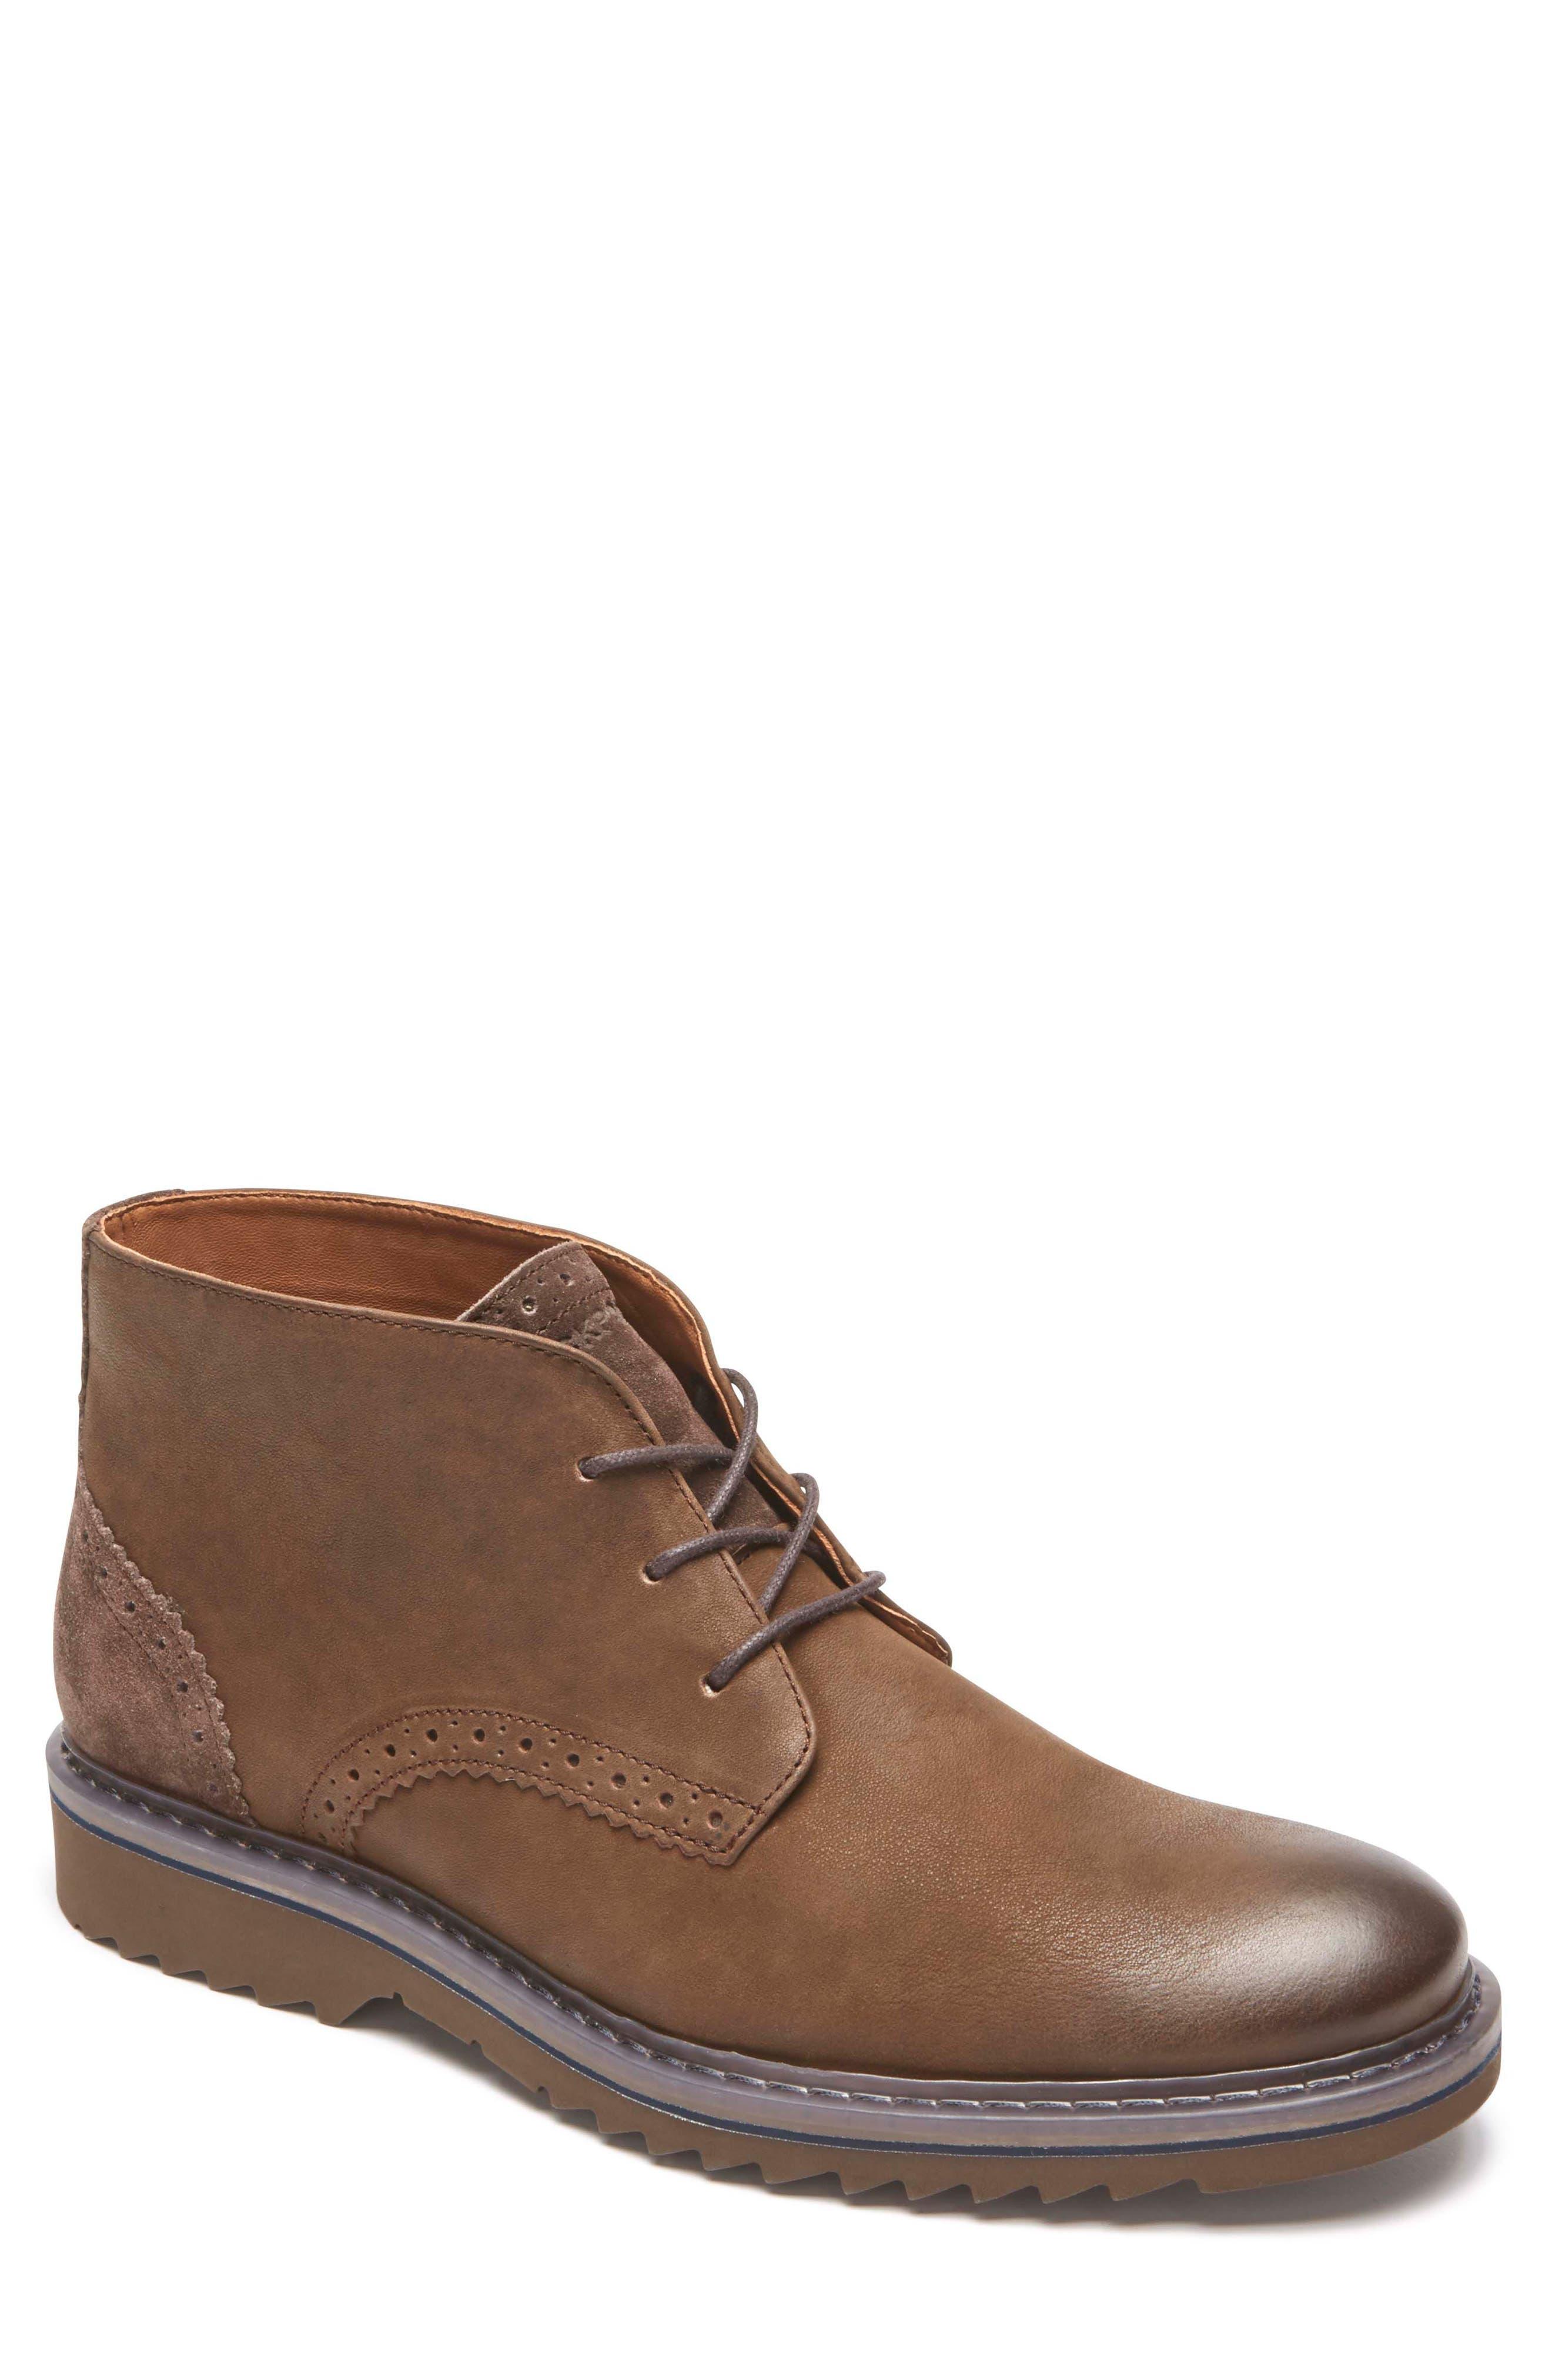 Jaxson Chukka Boot,                             Main thumbnail 1, color,                             Brown/ Brown Leather